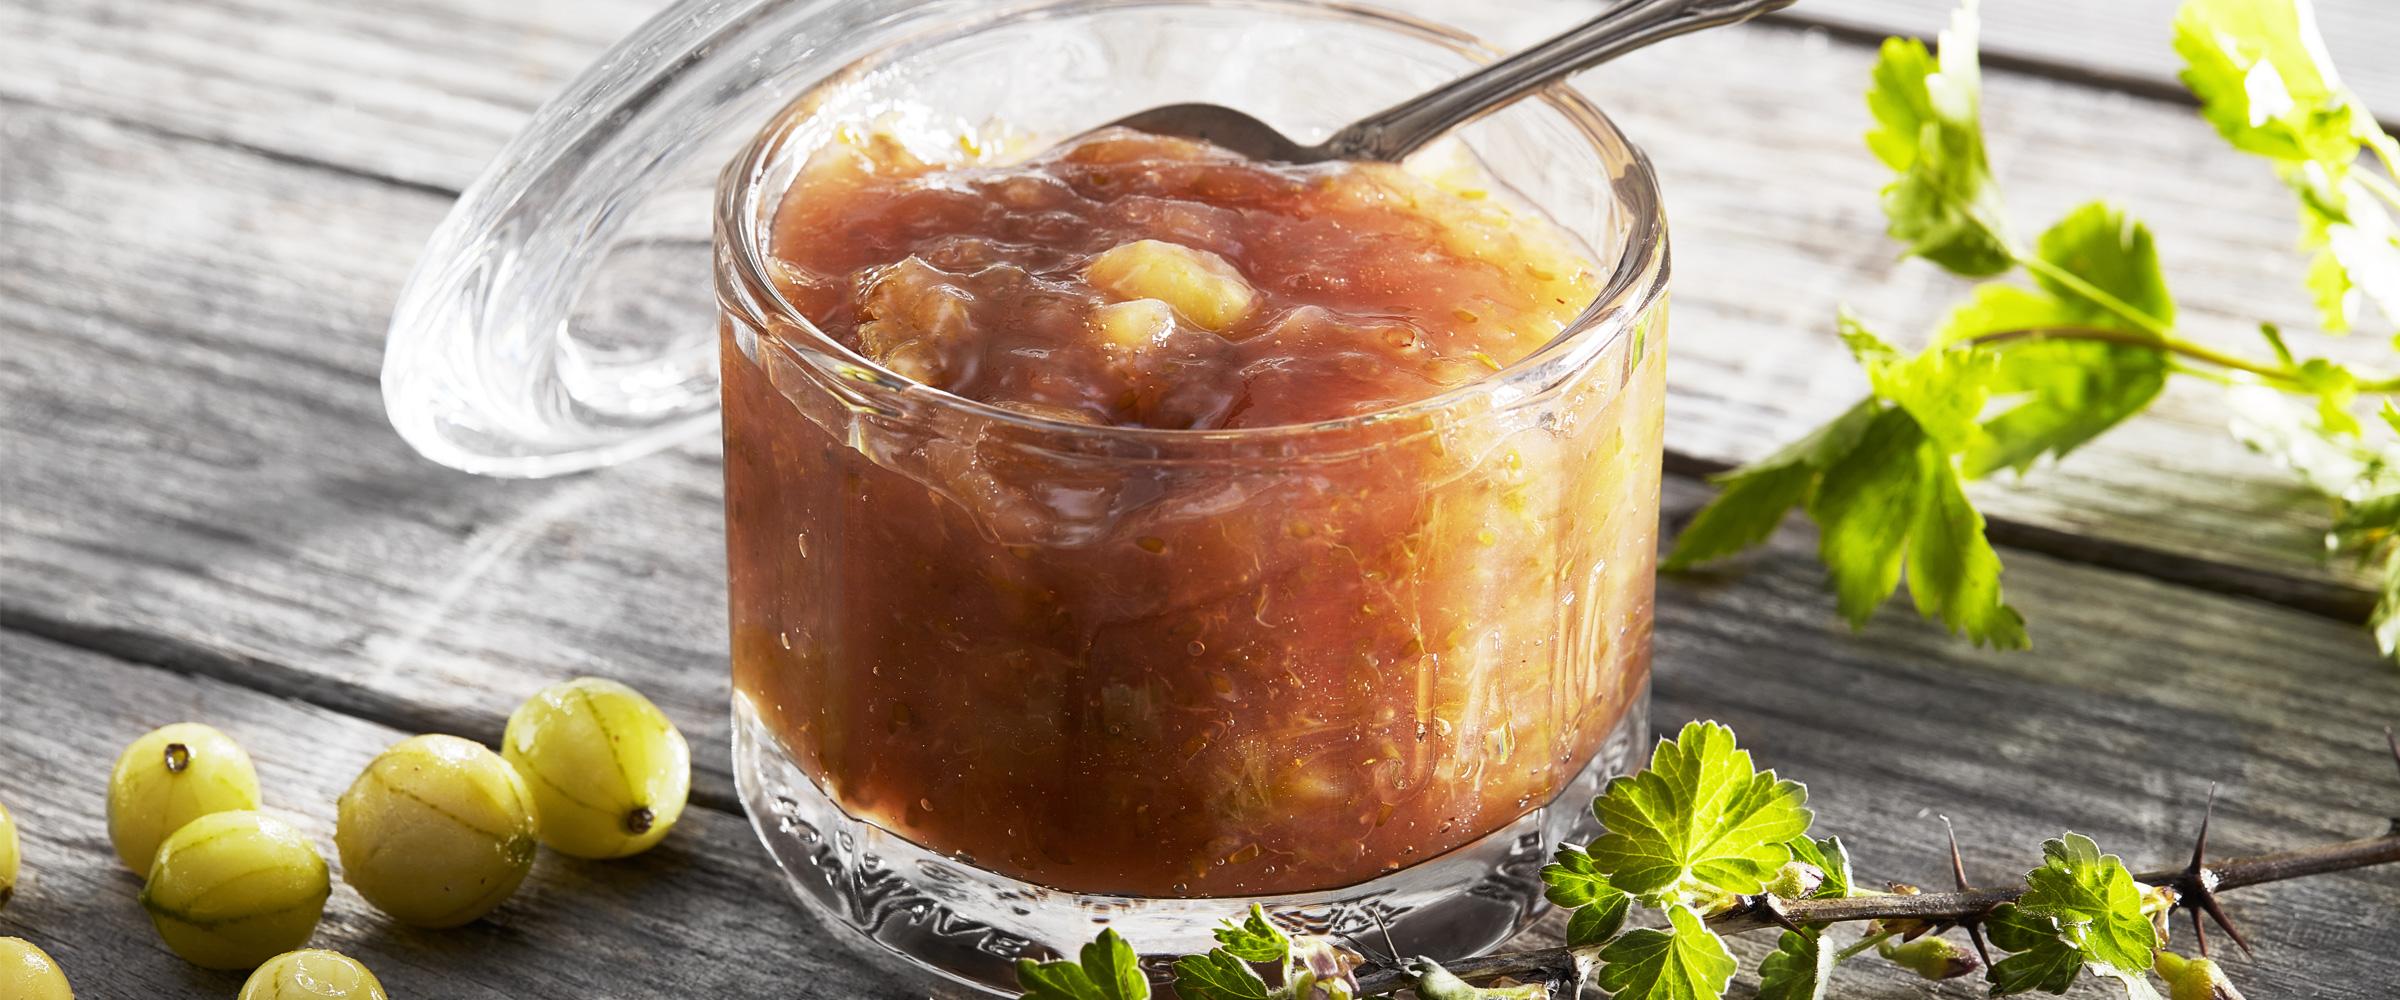 vindruvor recept marmelad